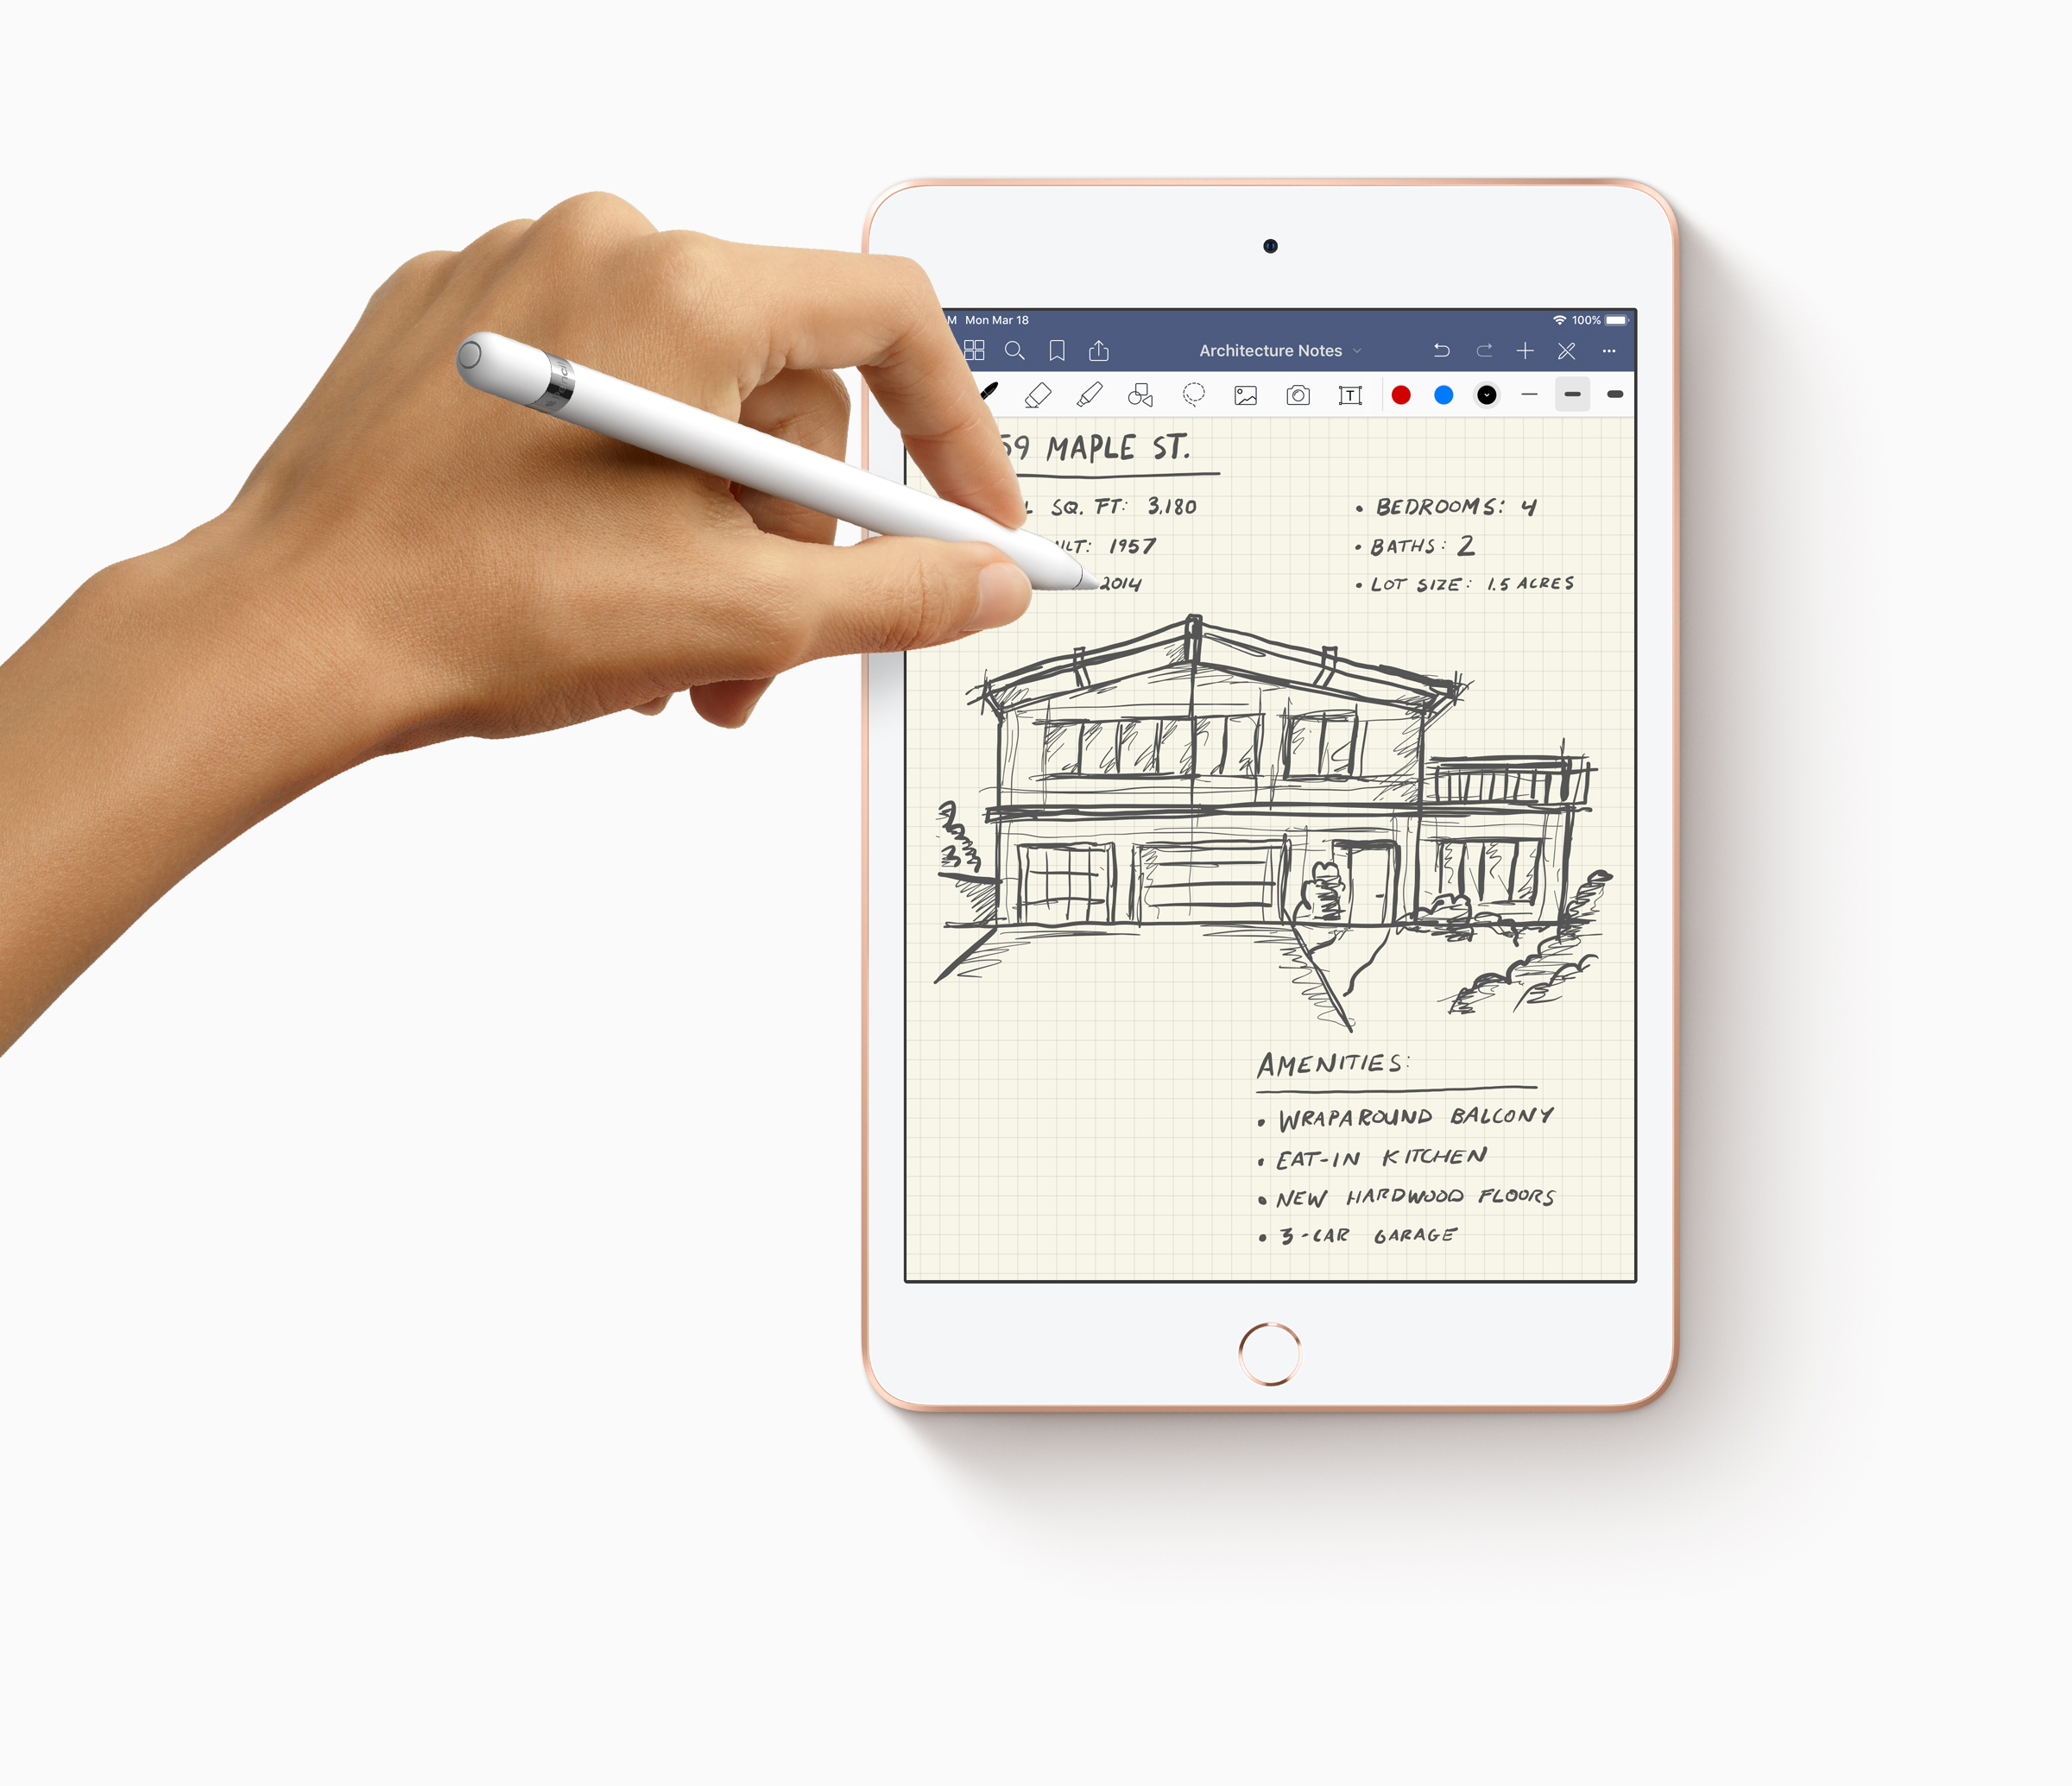 New-iPad-Mini-Apple-Pencil-with-hands-drawing-03162019.jpg